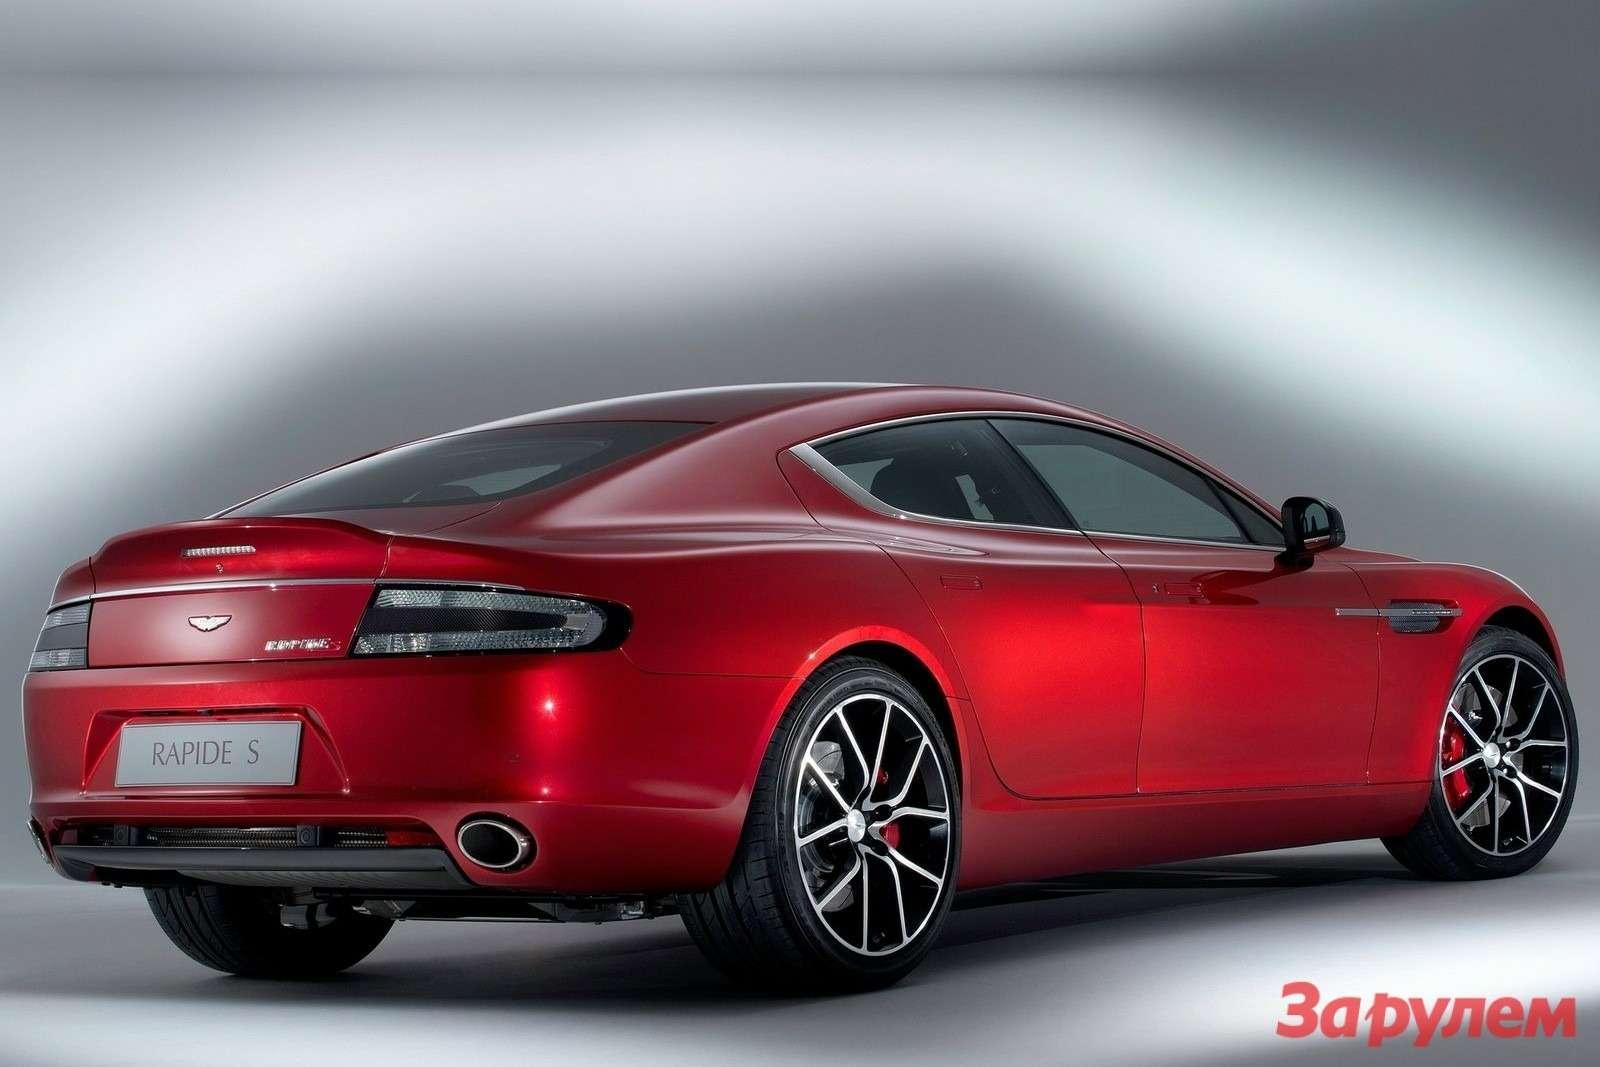 Aston Martin Rapide Sside-rear view